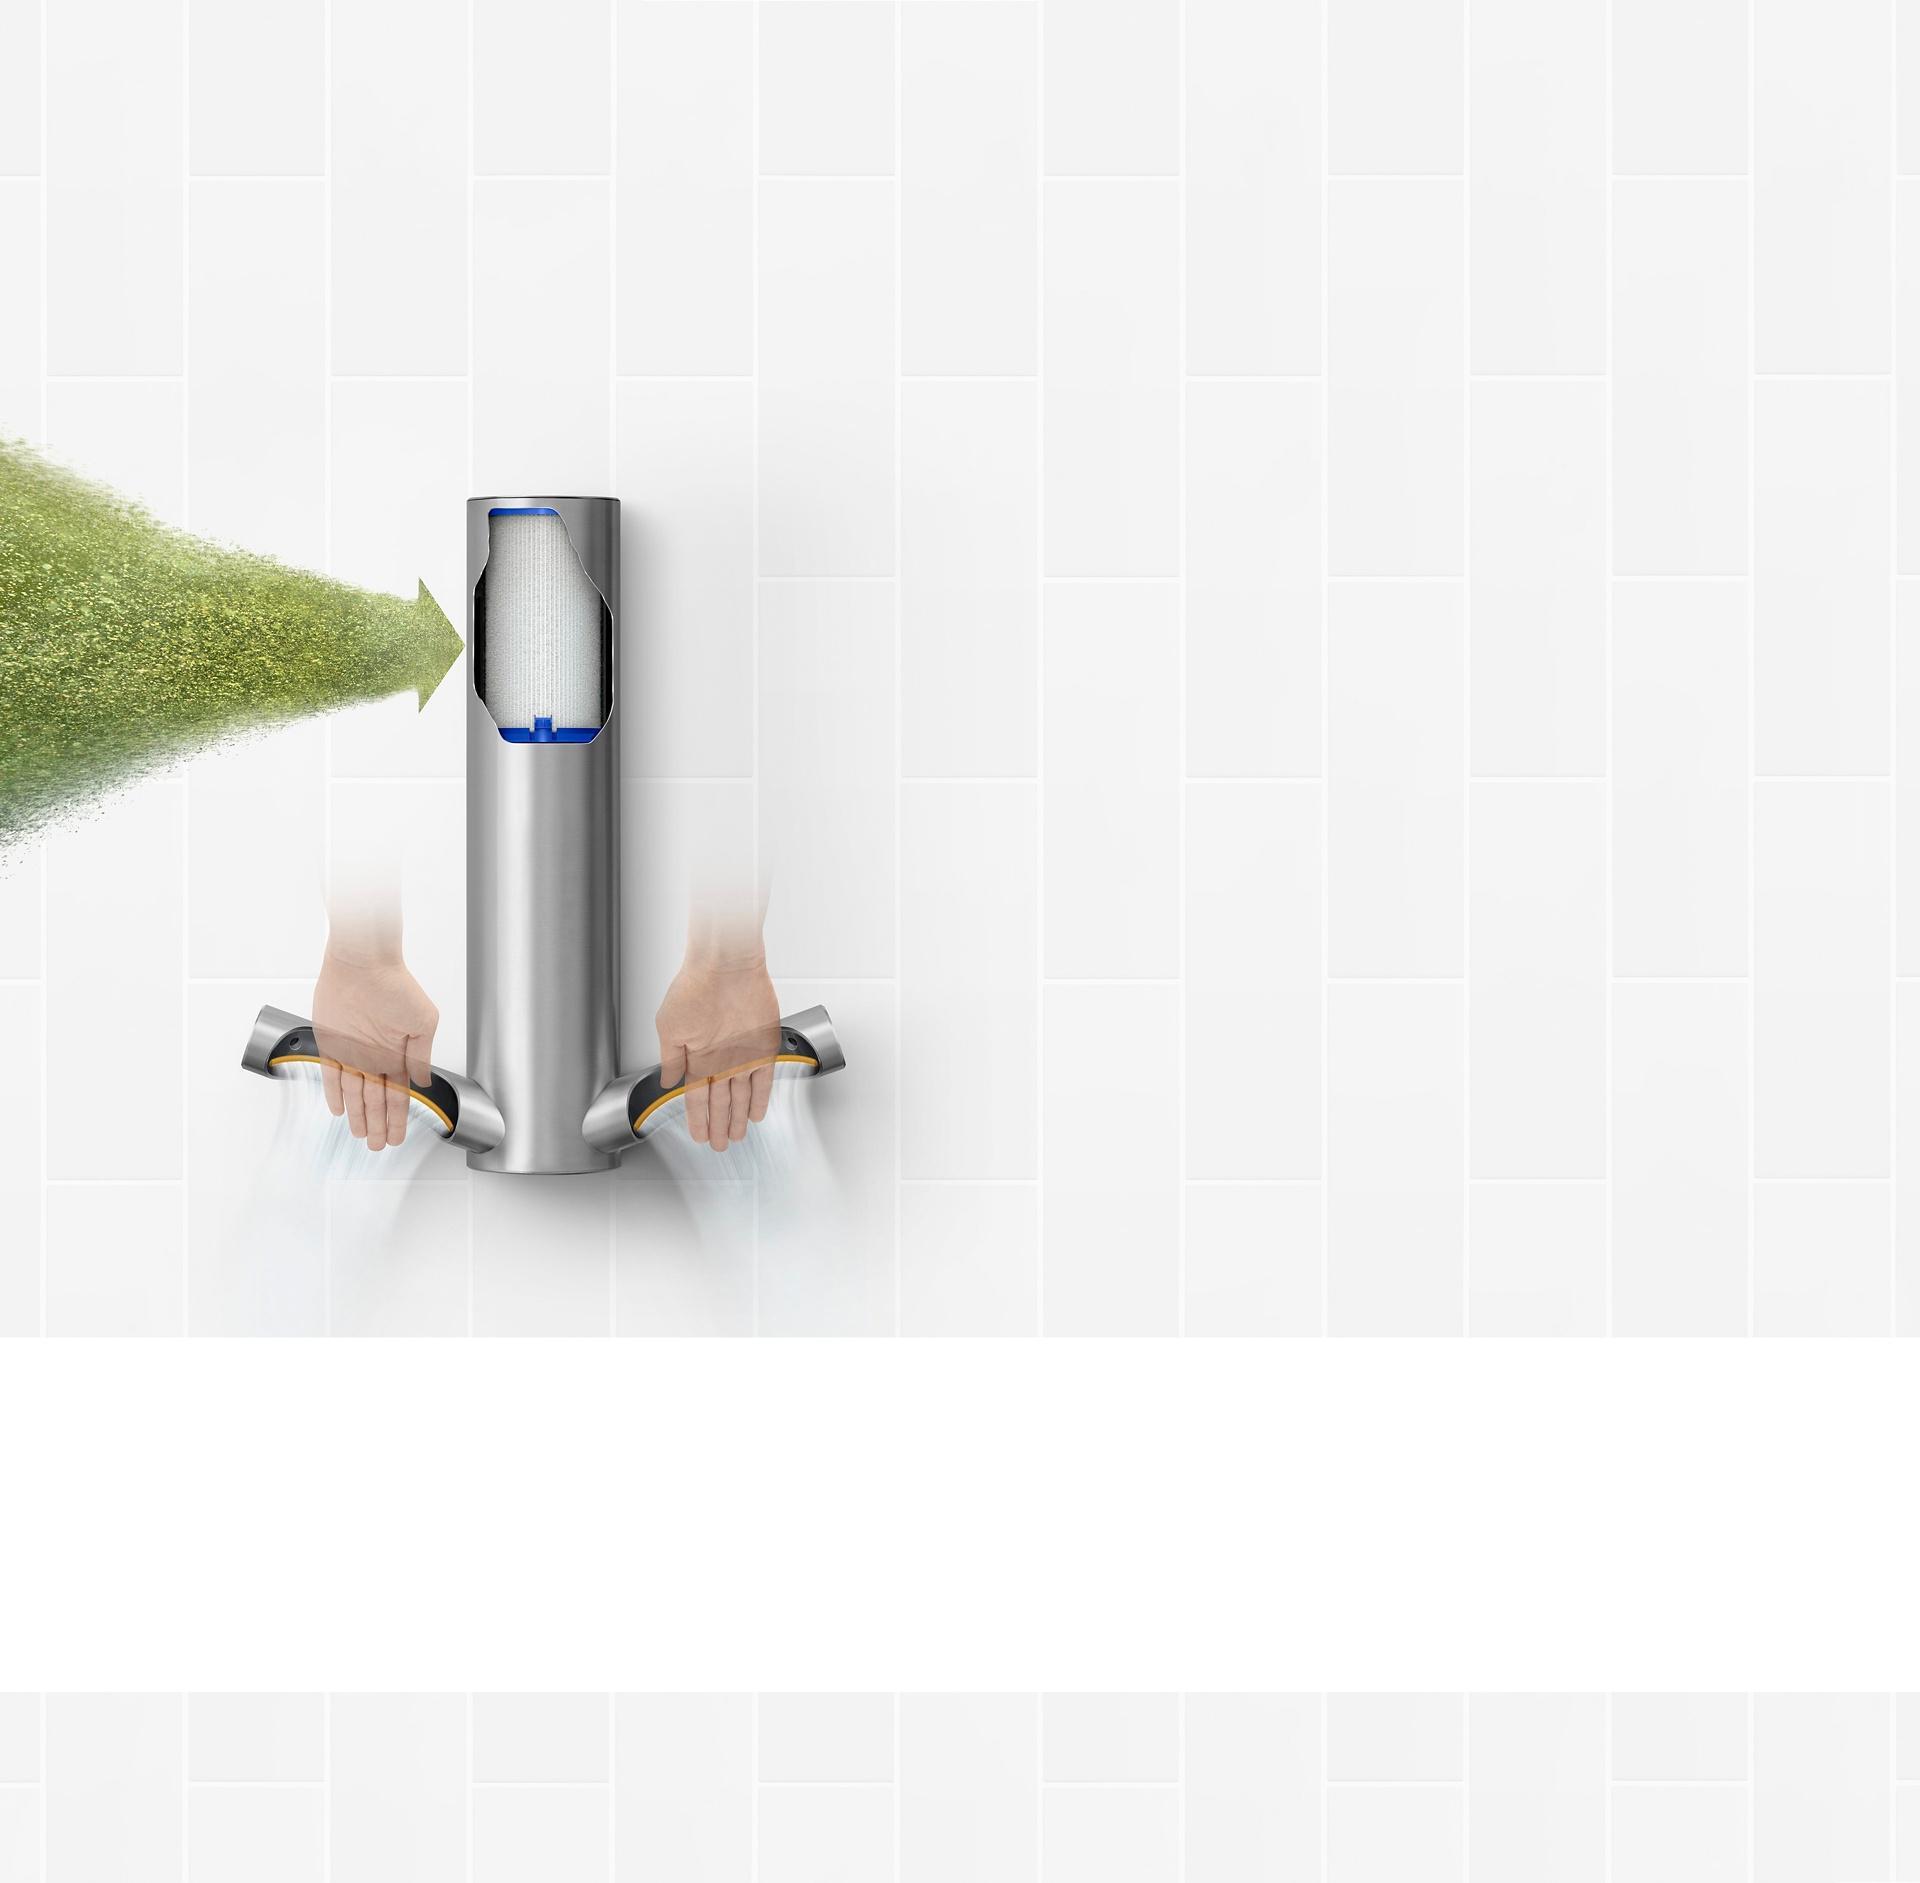 Dyson Airblade 9kJ hand dryer cutaway revealing a HEPA filter